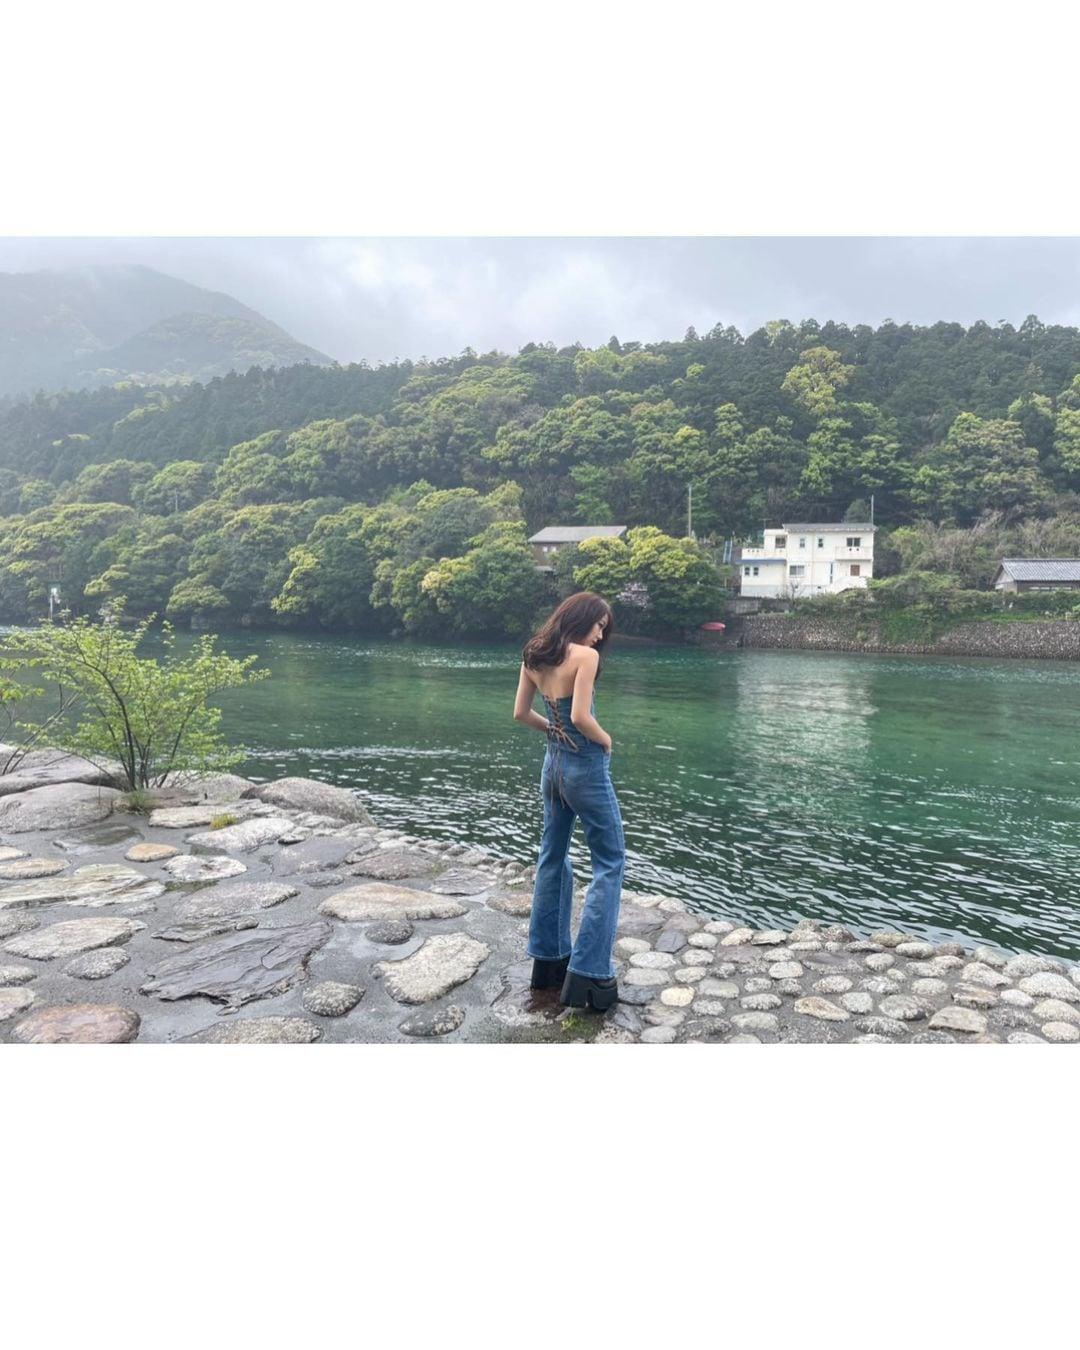 NMB48白間美瑠「色っぽくてかっこいい!」写真集『REBORN』オフショット公開にファン歓喜【画像8枚】の画像007